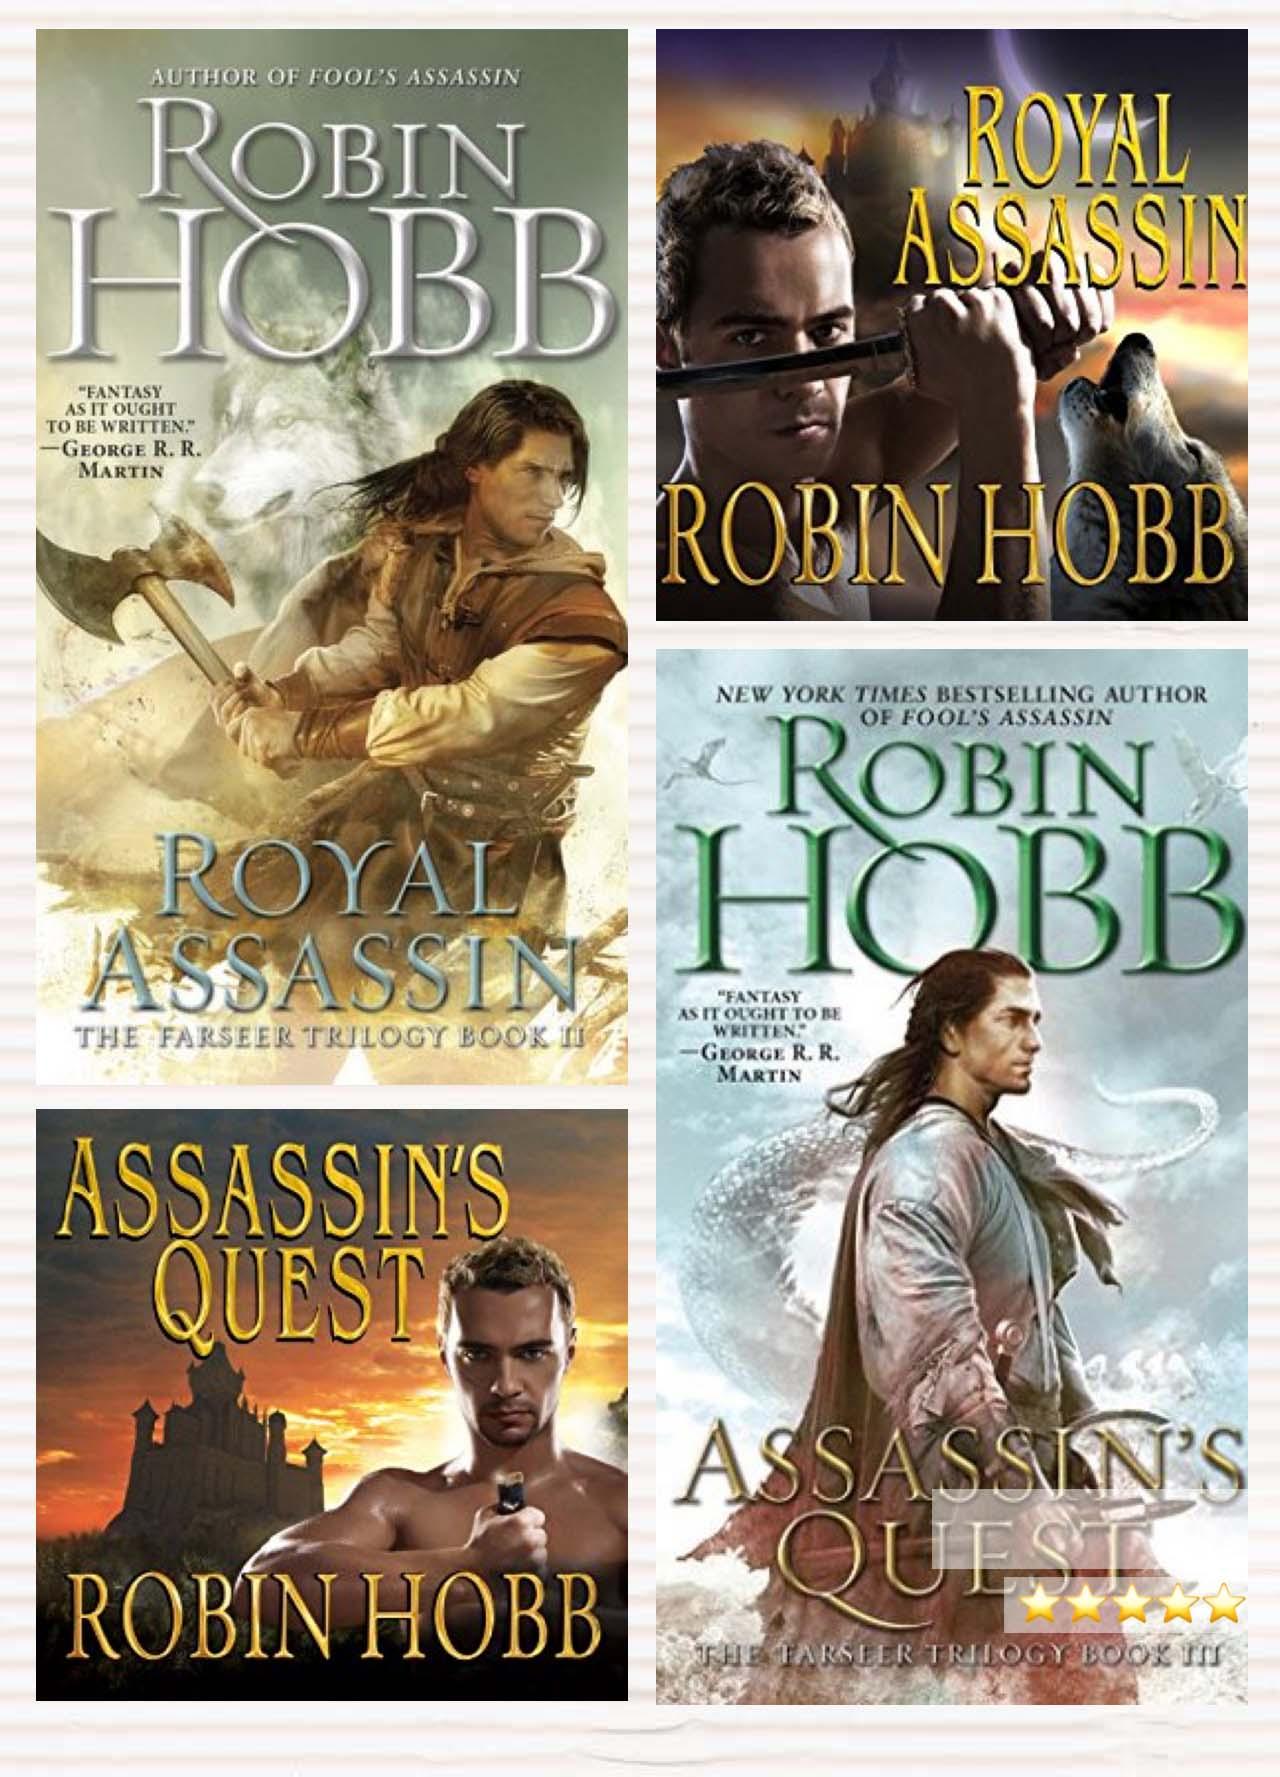 Assassins Quest : assassins, quest, Audiobook, Review:, Royal, Assassin, Assassin's, Quest, (Farseer, Trilogy), Robin, Marienela